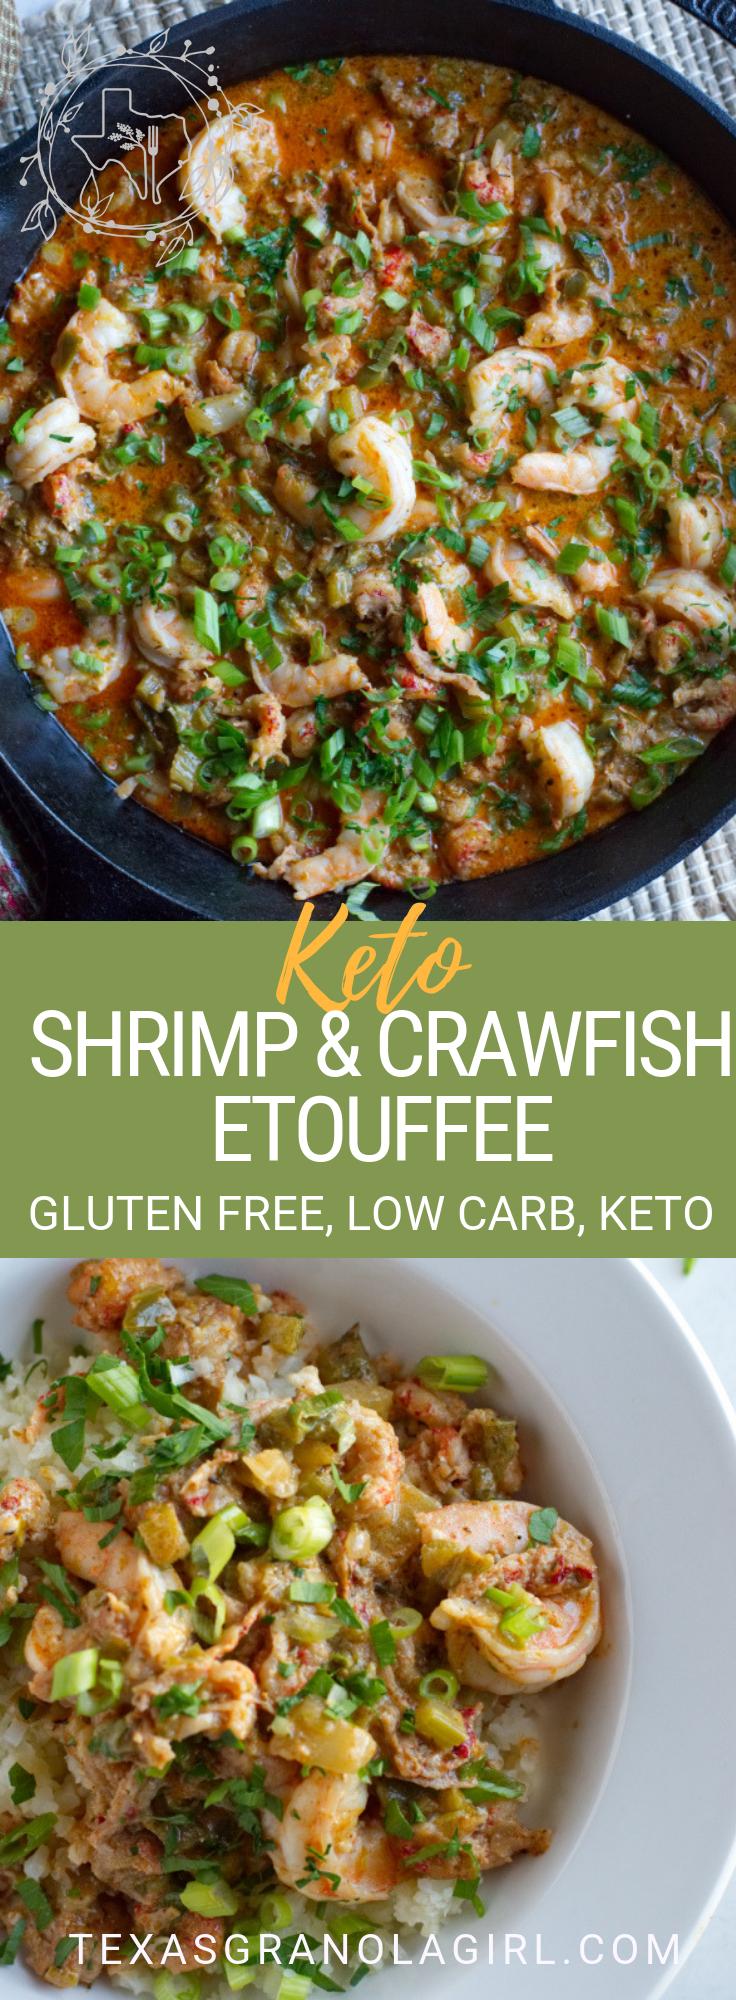 Photo of Keto Shrimp Etouffee with Crawfish | Texas Granola Girl | Texas & Southern Keto Comfort Food Recipes